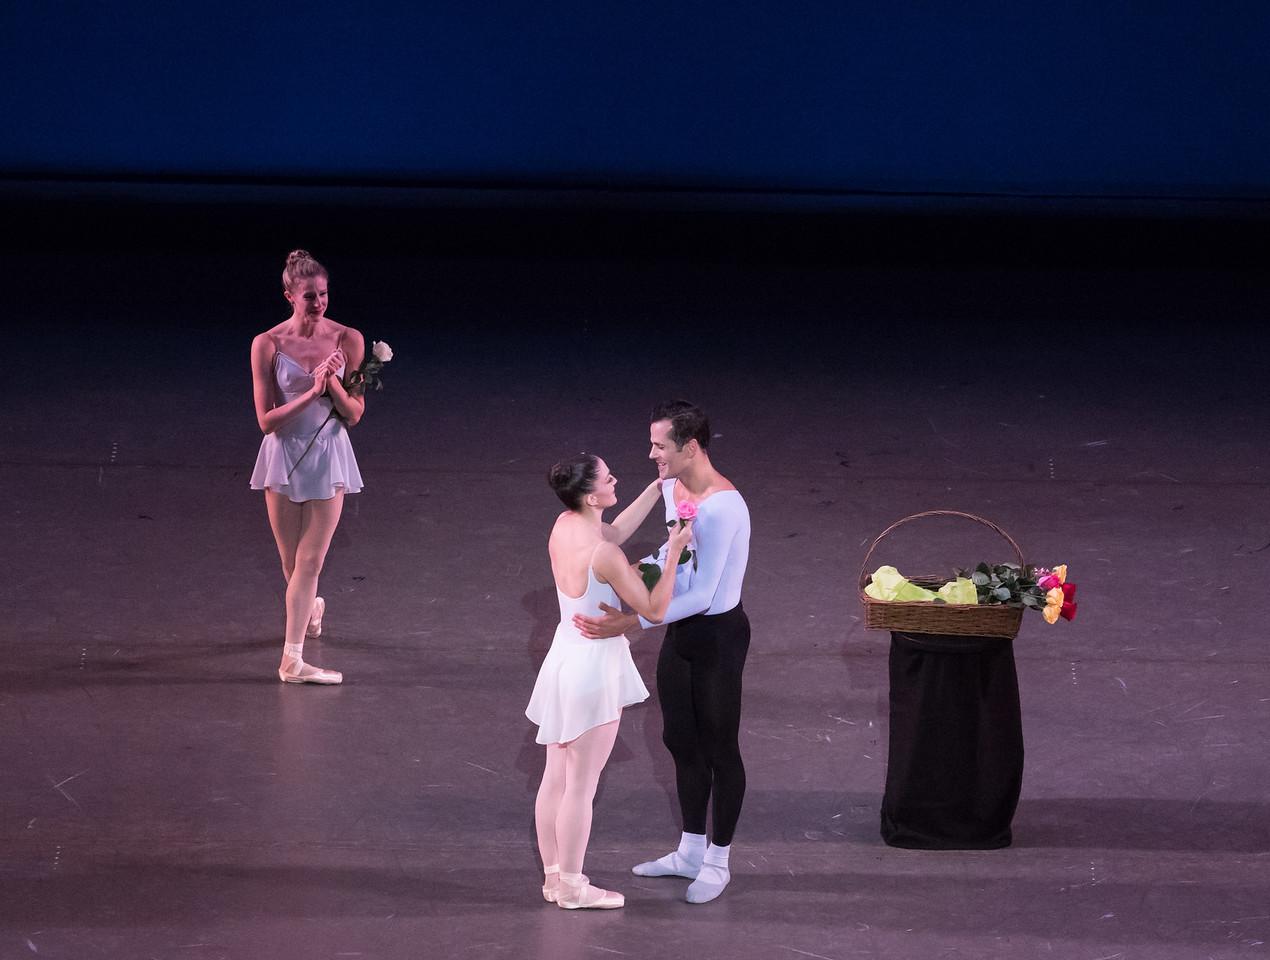 Robert Fairchild and Ashley Bouder, Fairchild's Final NYCB Performance, October 15, 2017